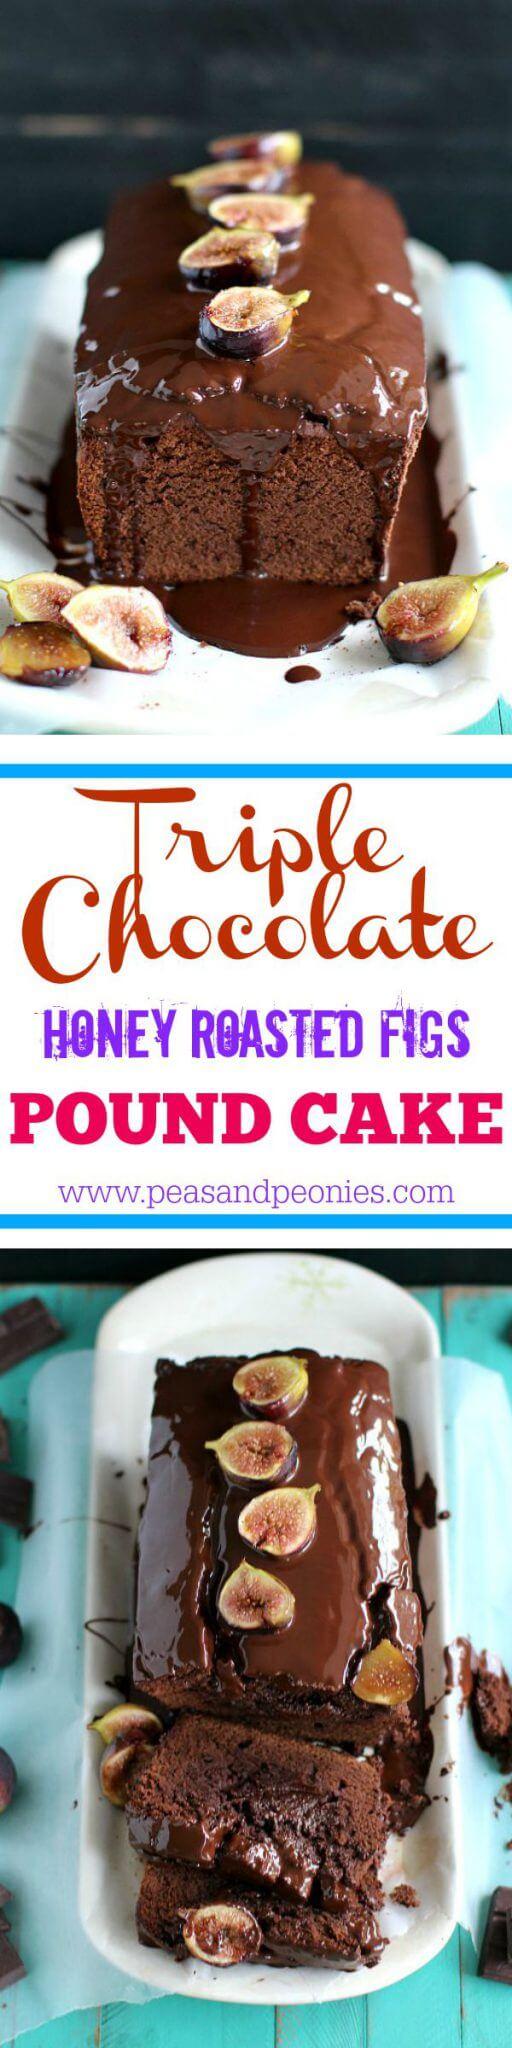 triple chocolate fig pound cake